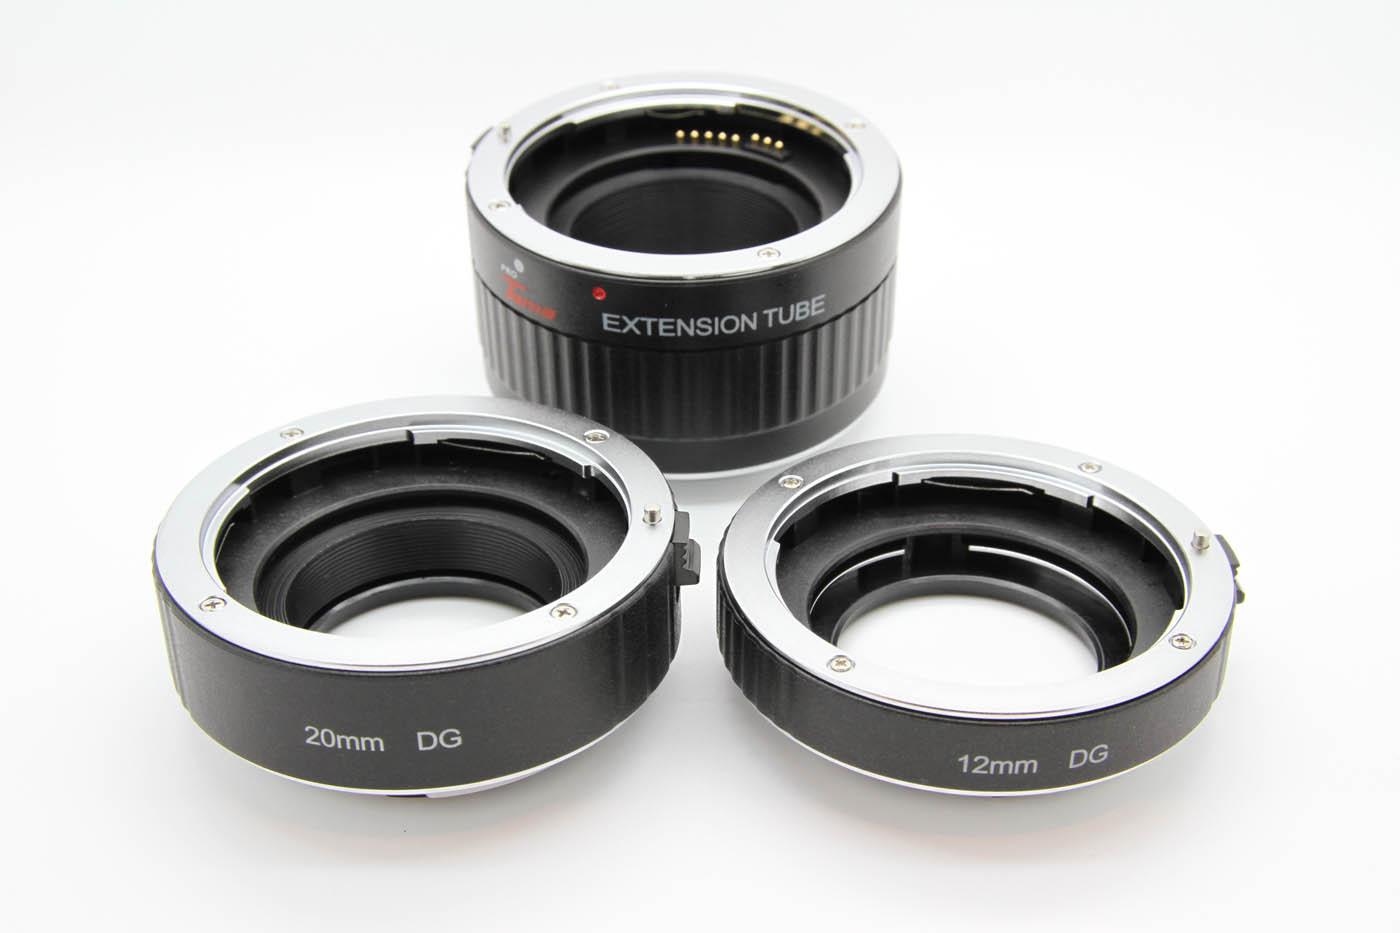 ProTama Auto Focus Macro Extension Tube Set DG-C (For Canon EOS EF/EFS Lens) - 3 Tubes